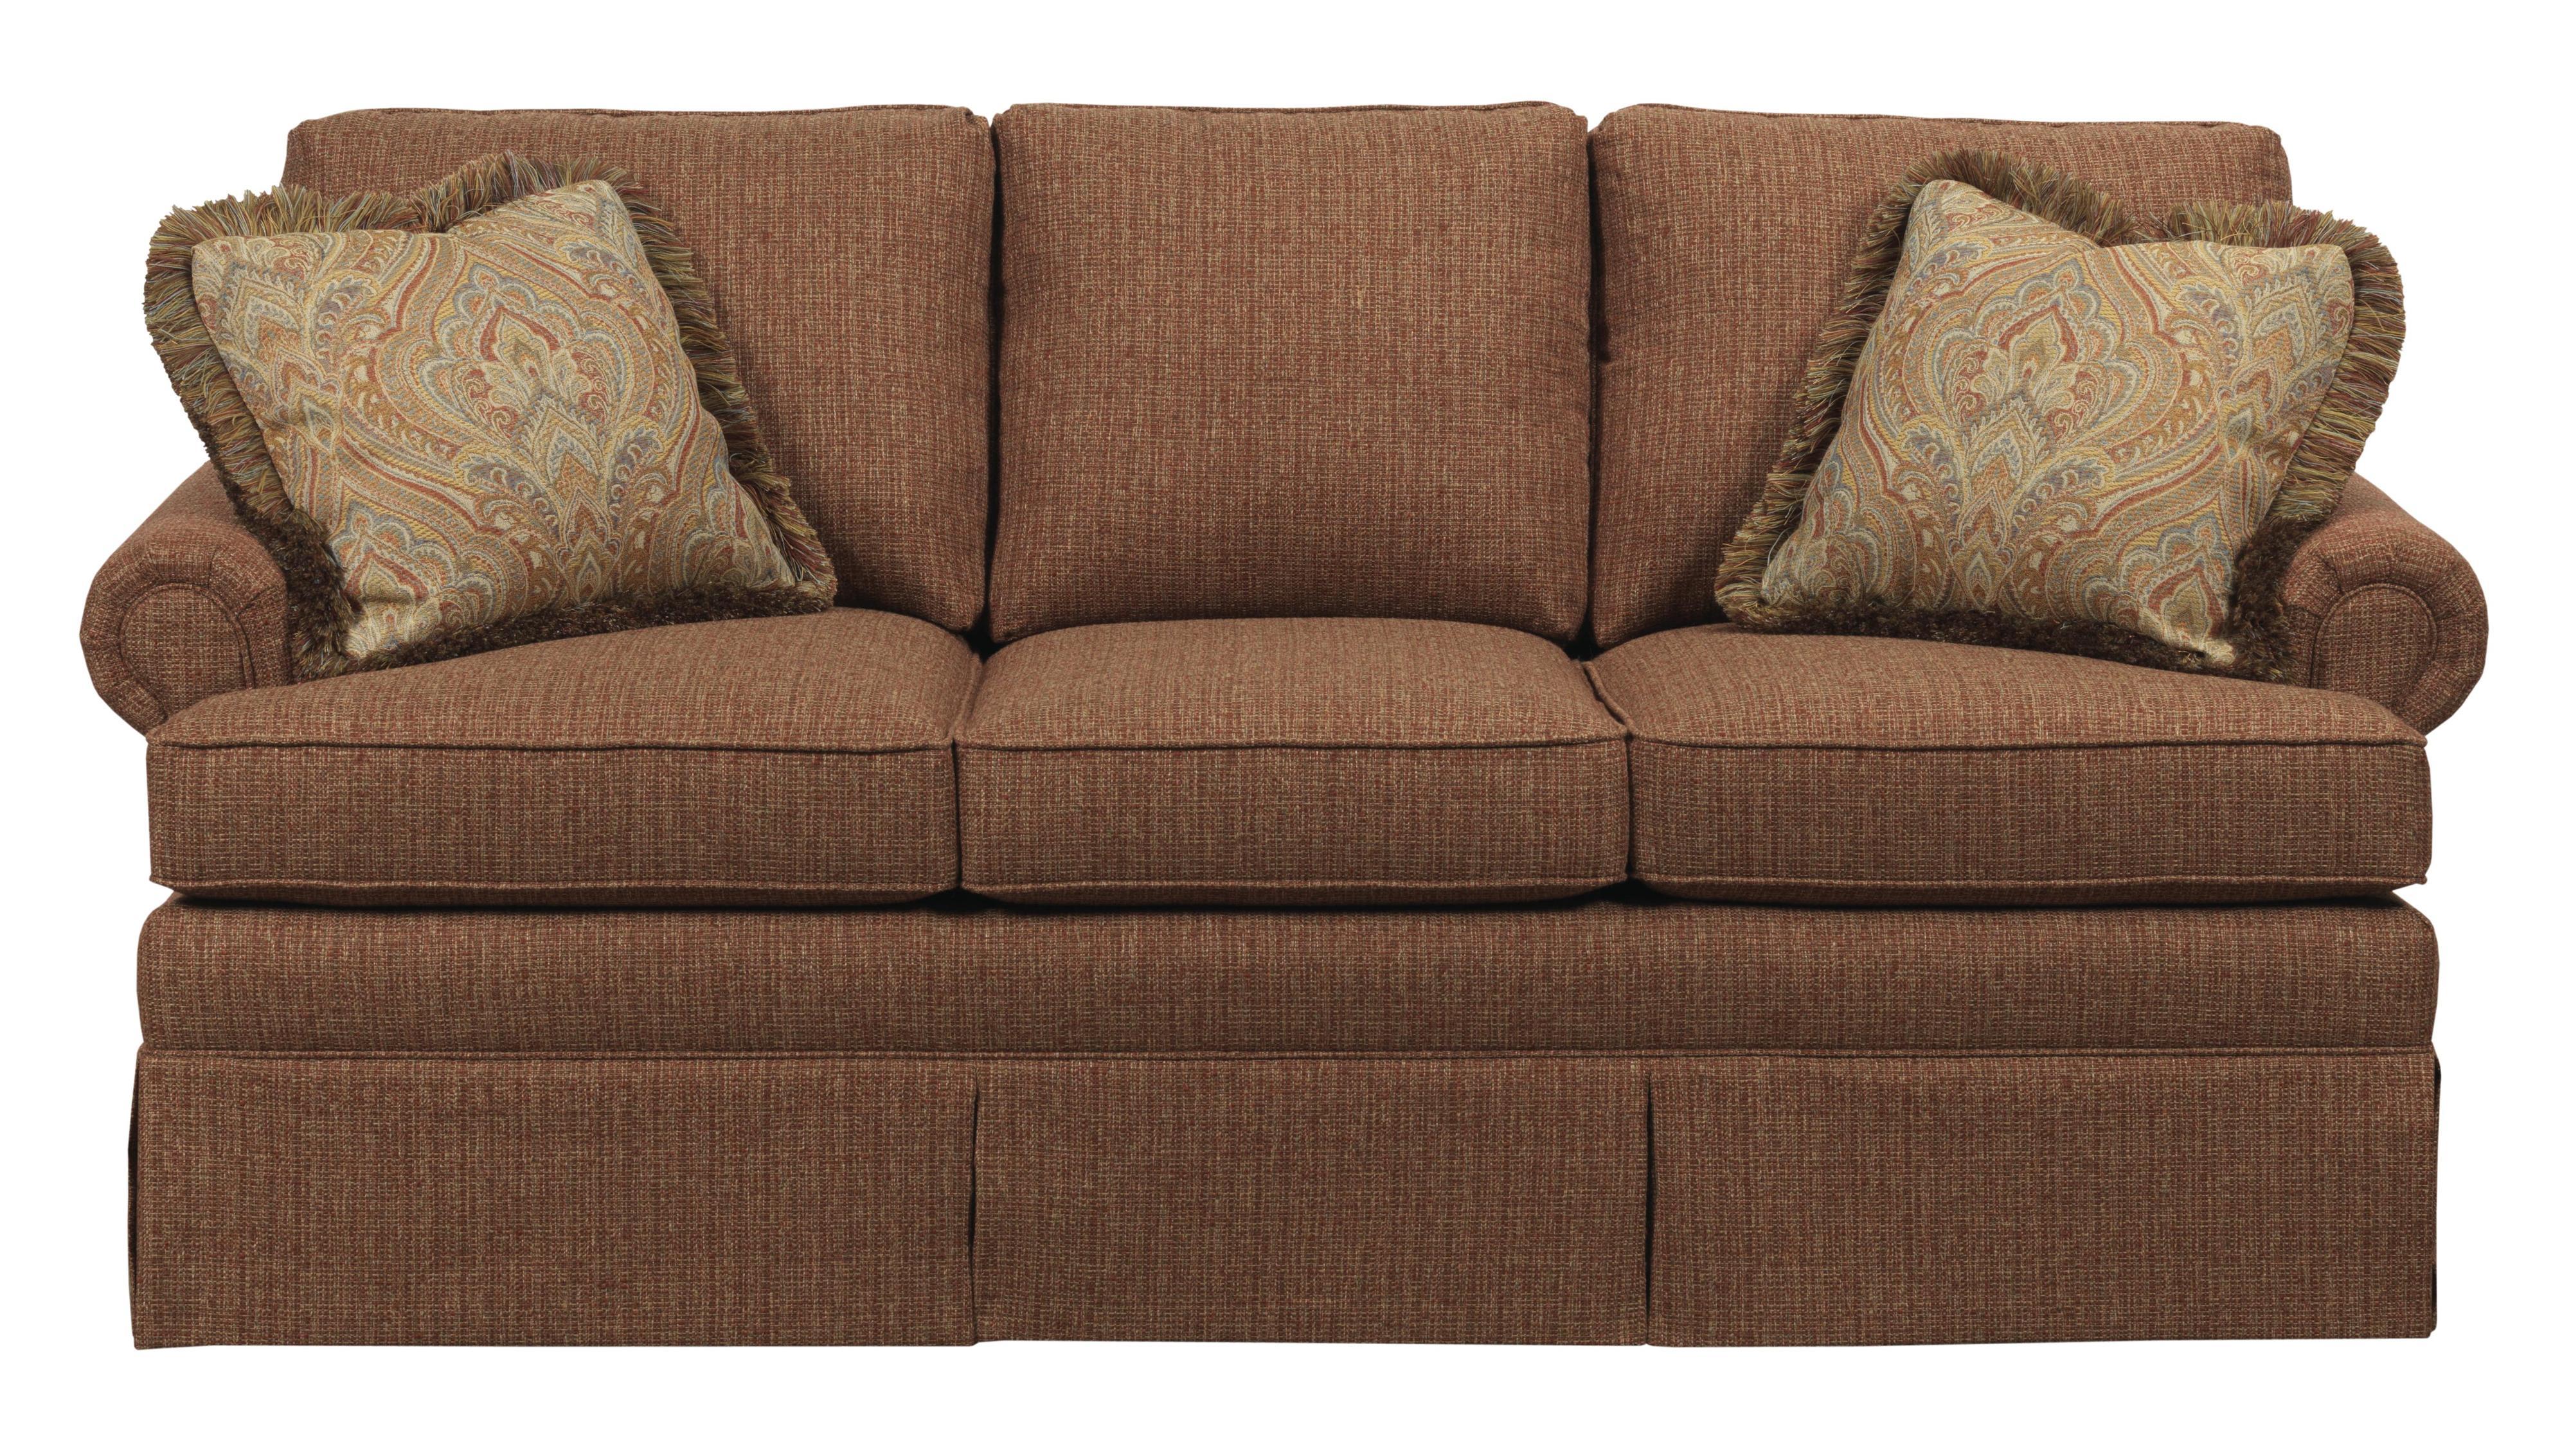 Customizable 75 Sofa By Kincaid Furniture Wolf And Gardiner Wolf Furniture